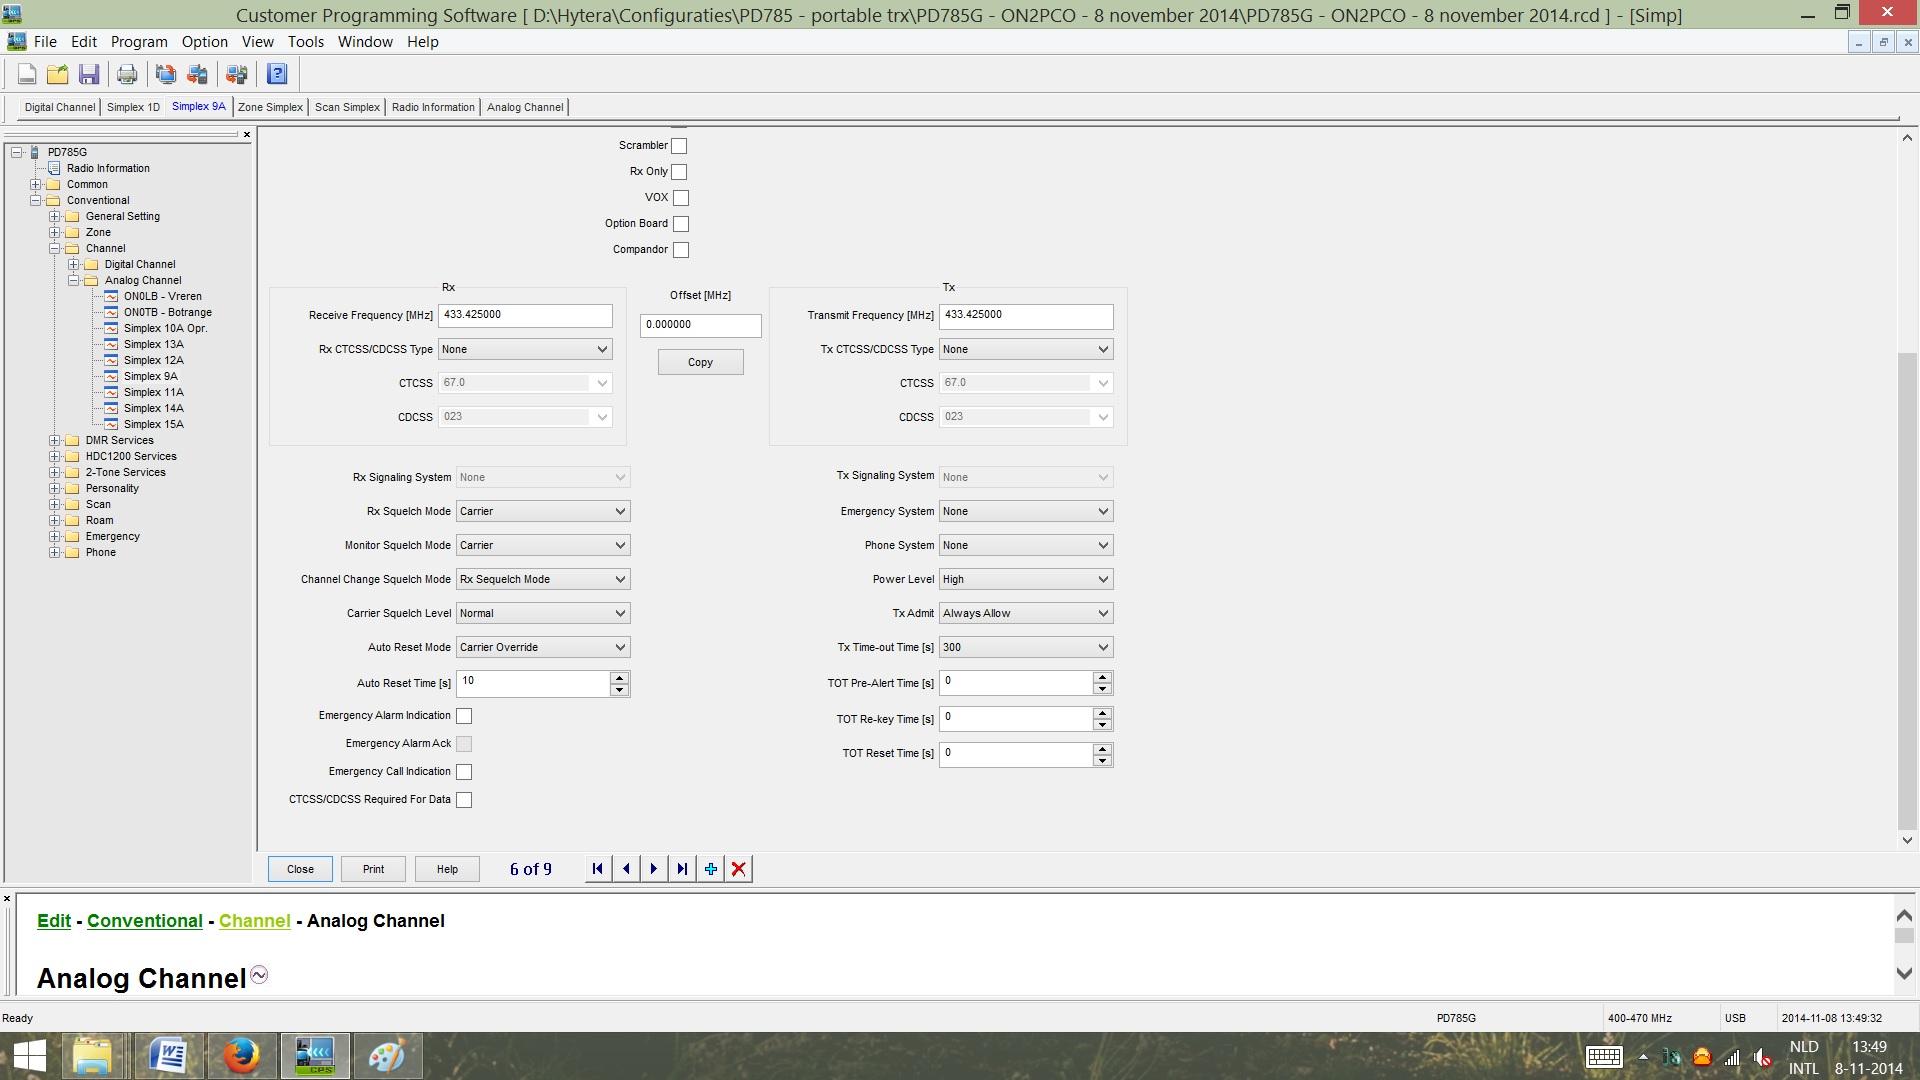 FIGUUR 6 - Channel Simplex Analoog - deel 2